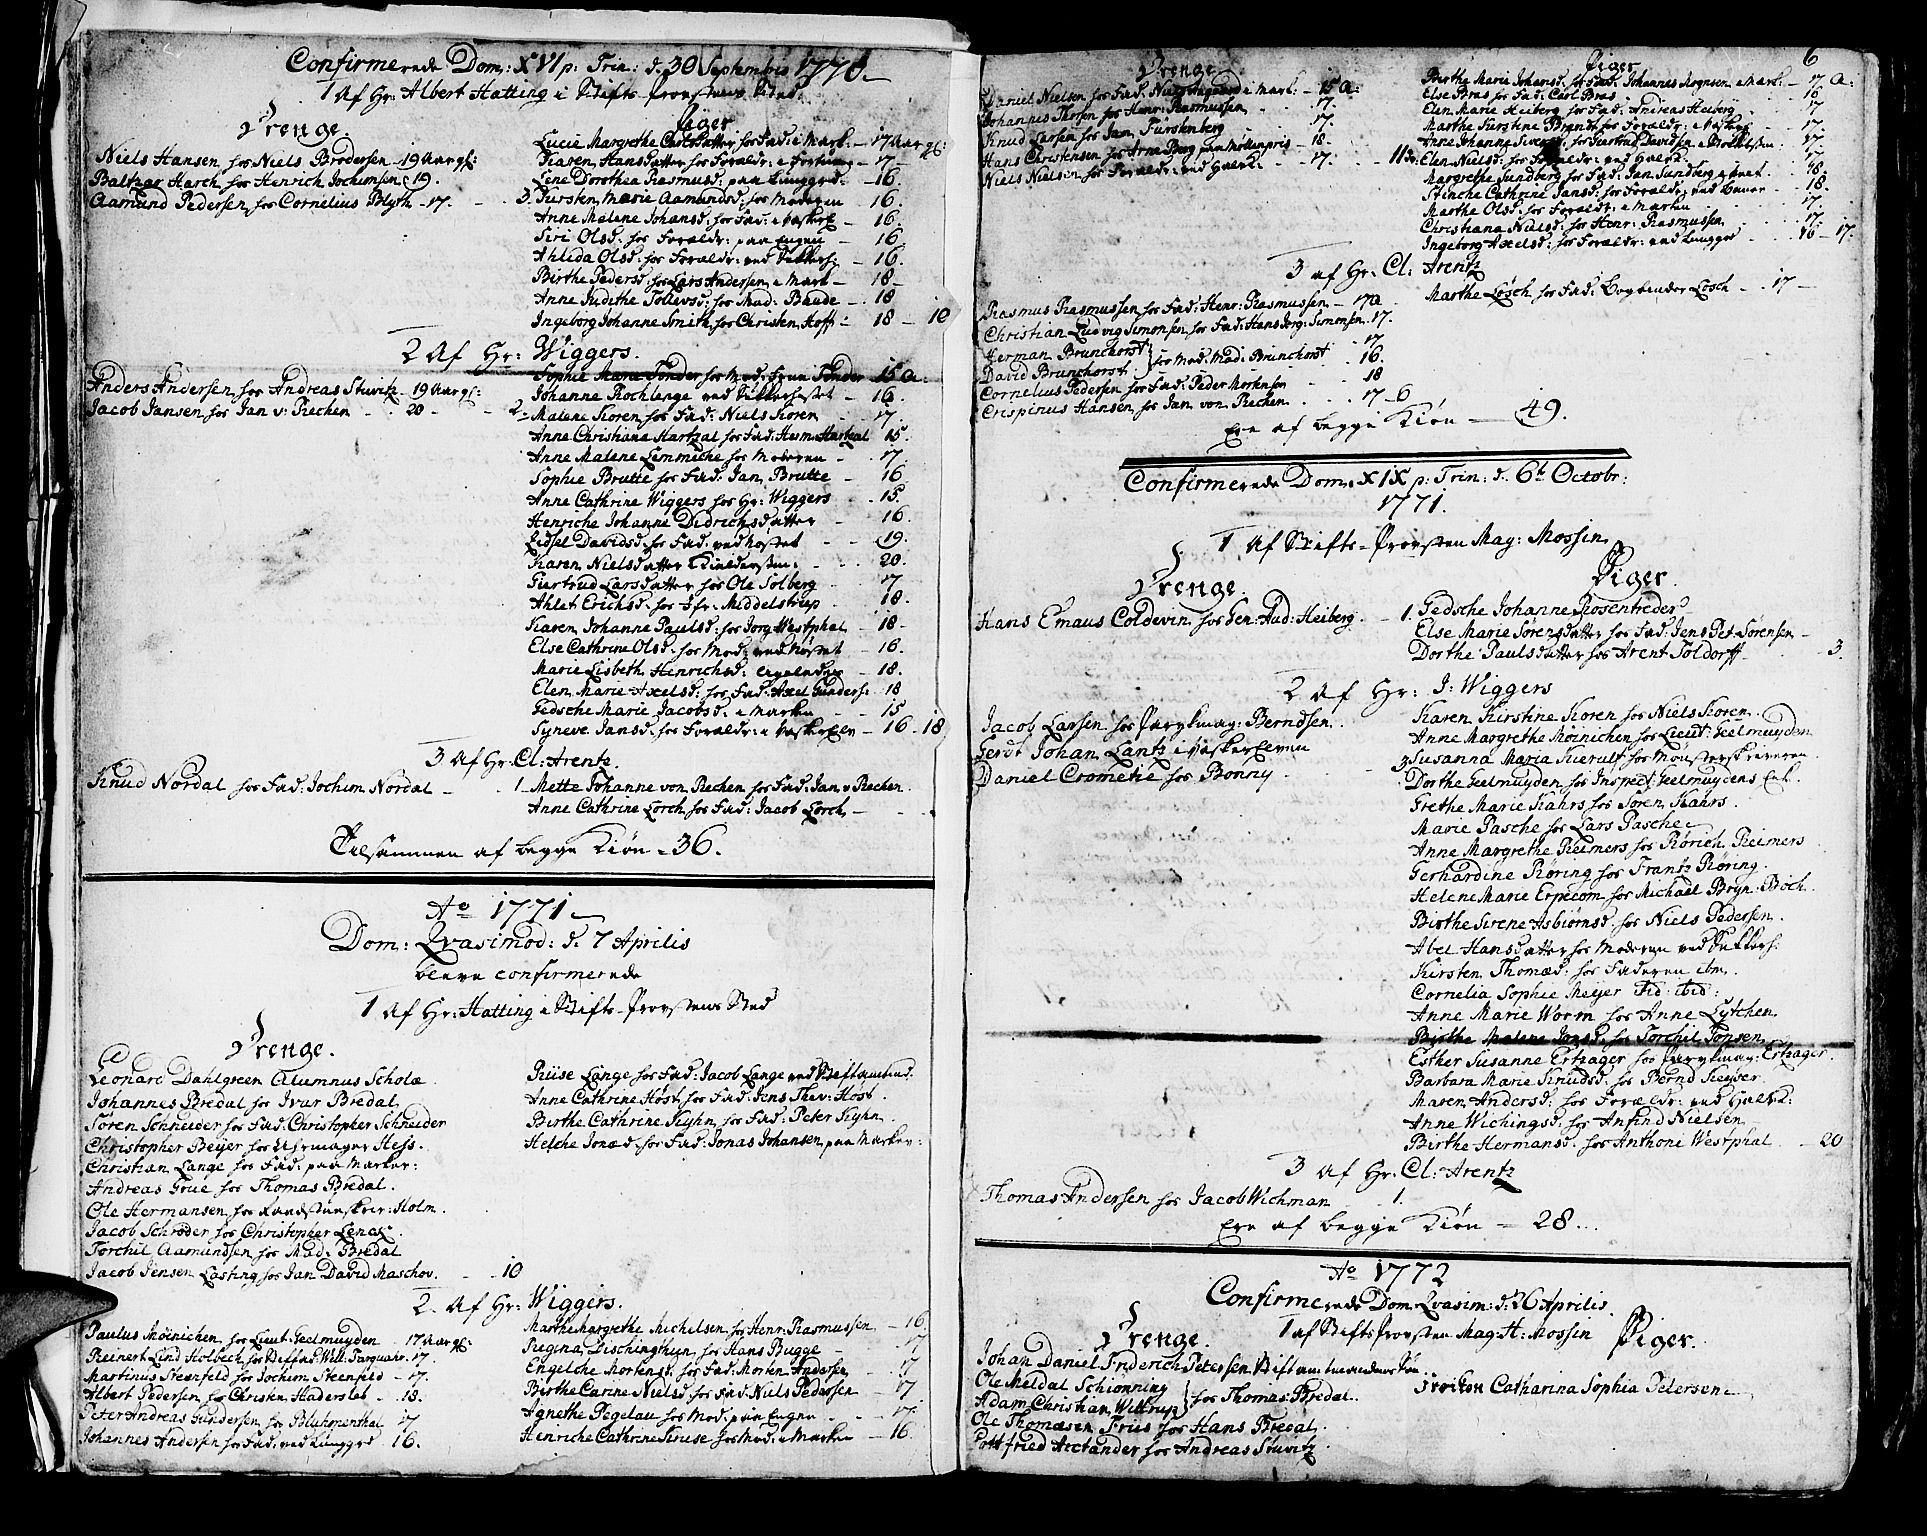 SAB, Domkirken sokneprestembete, H/Haa/L0004: Ministerialbok nr. A 4, 1763-1820, s. 6